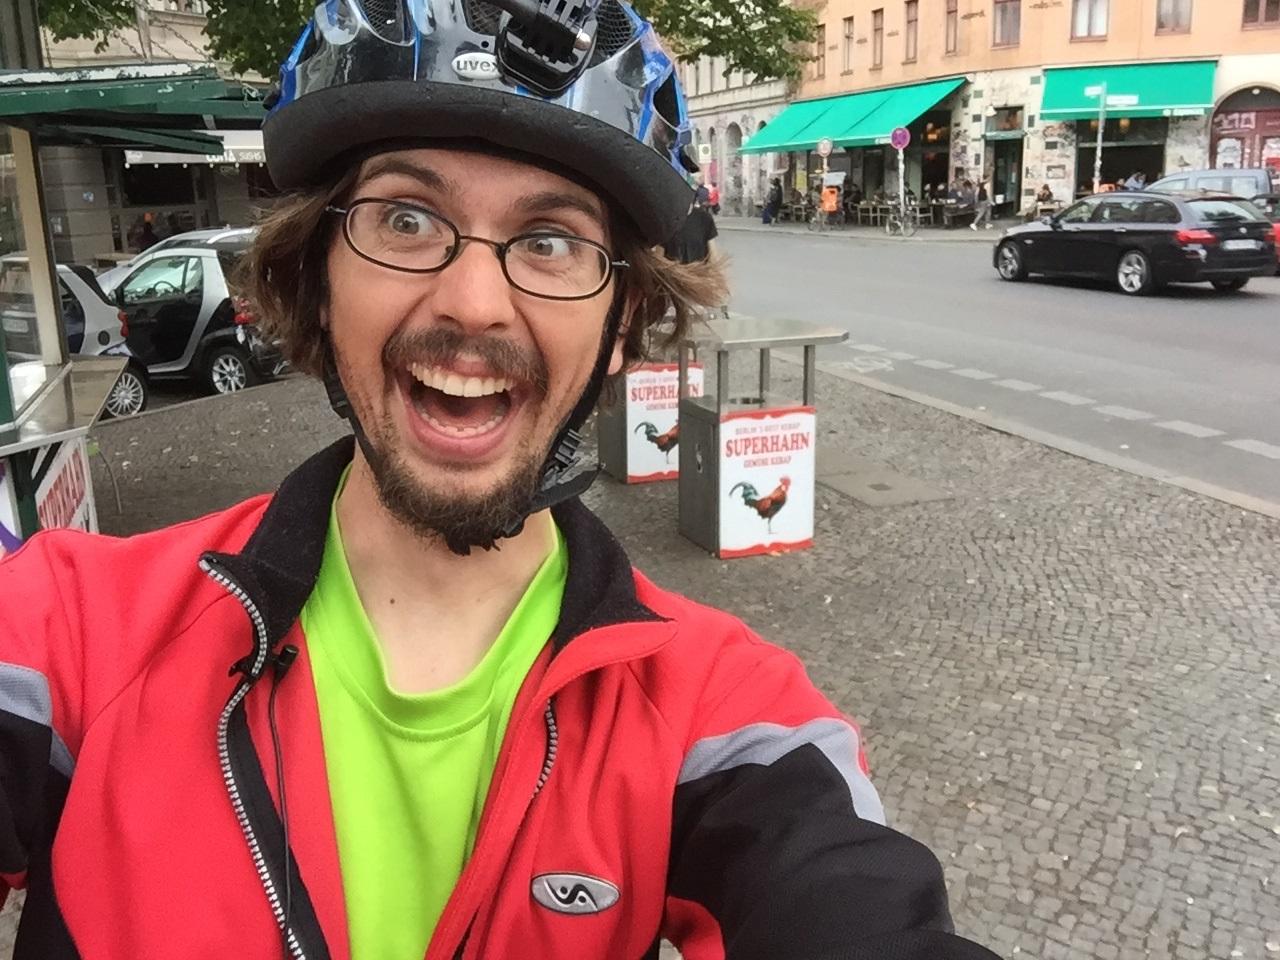 Radtouren und Radwege in Berlin Spreeradweg